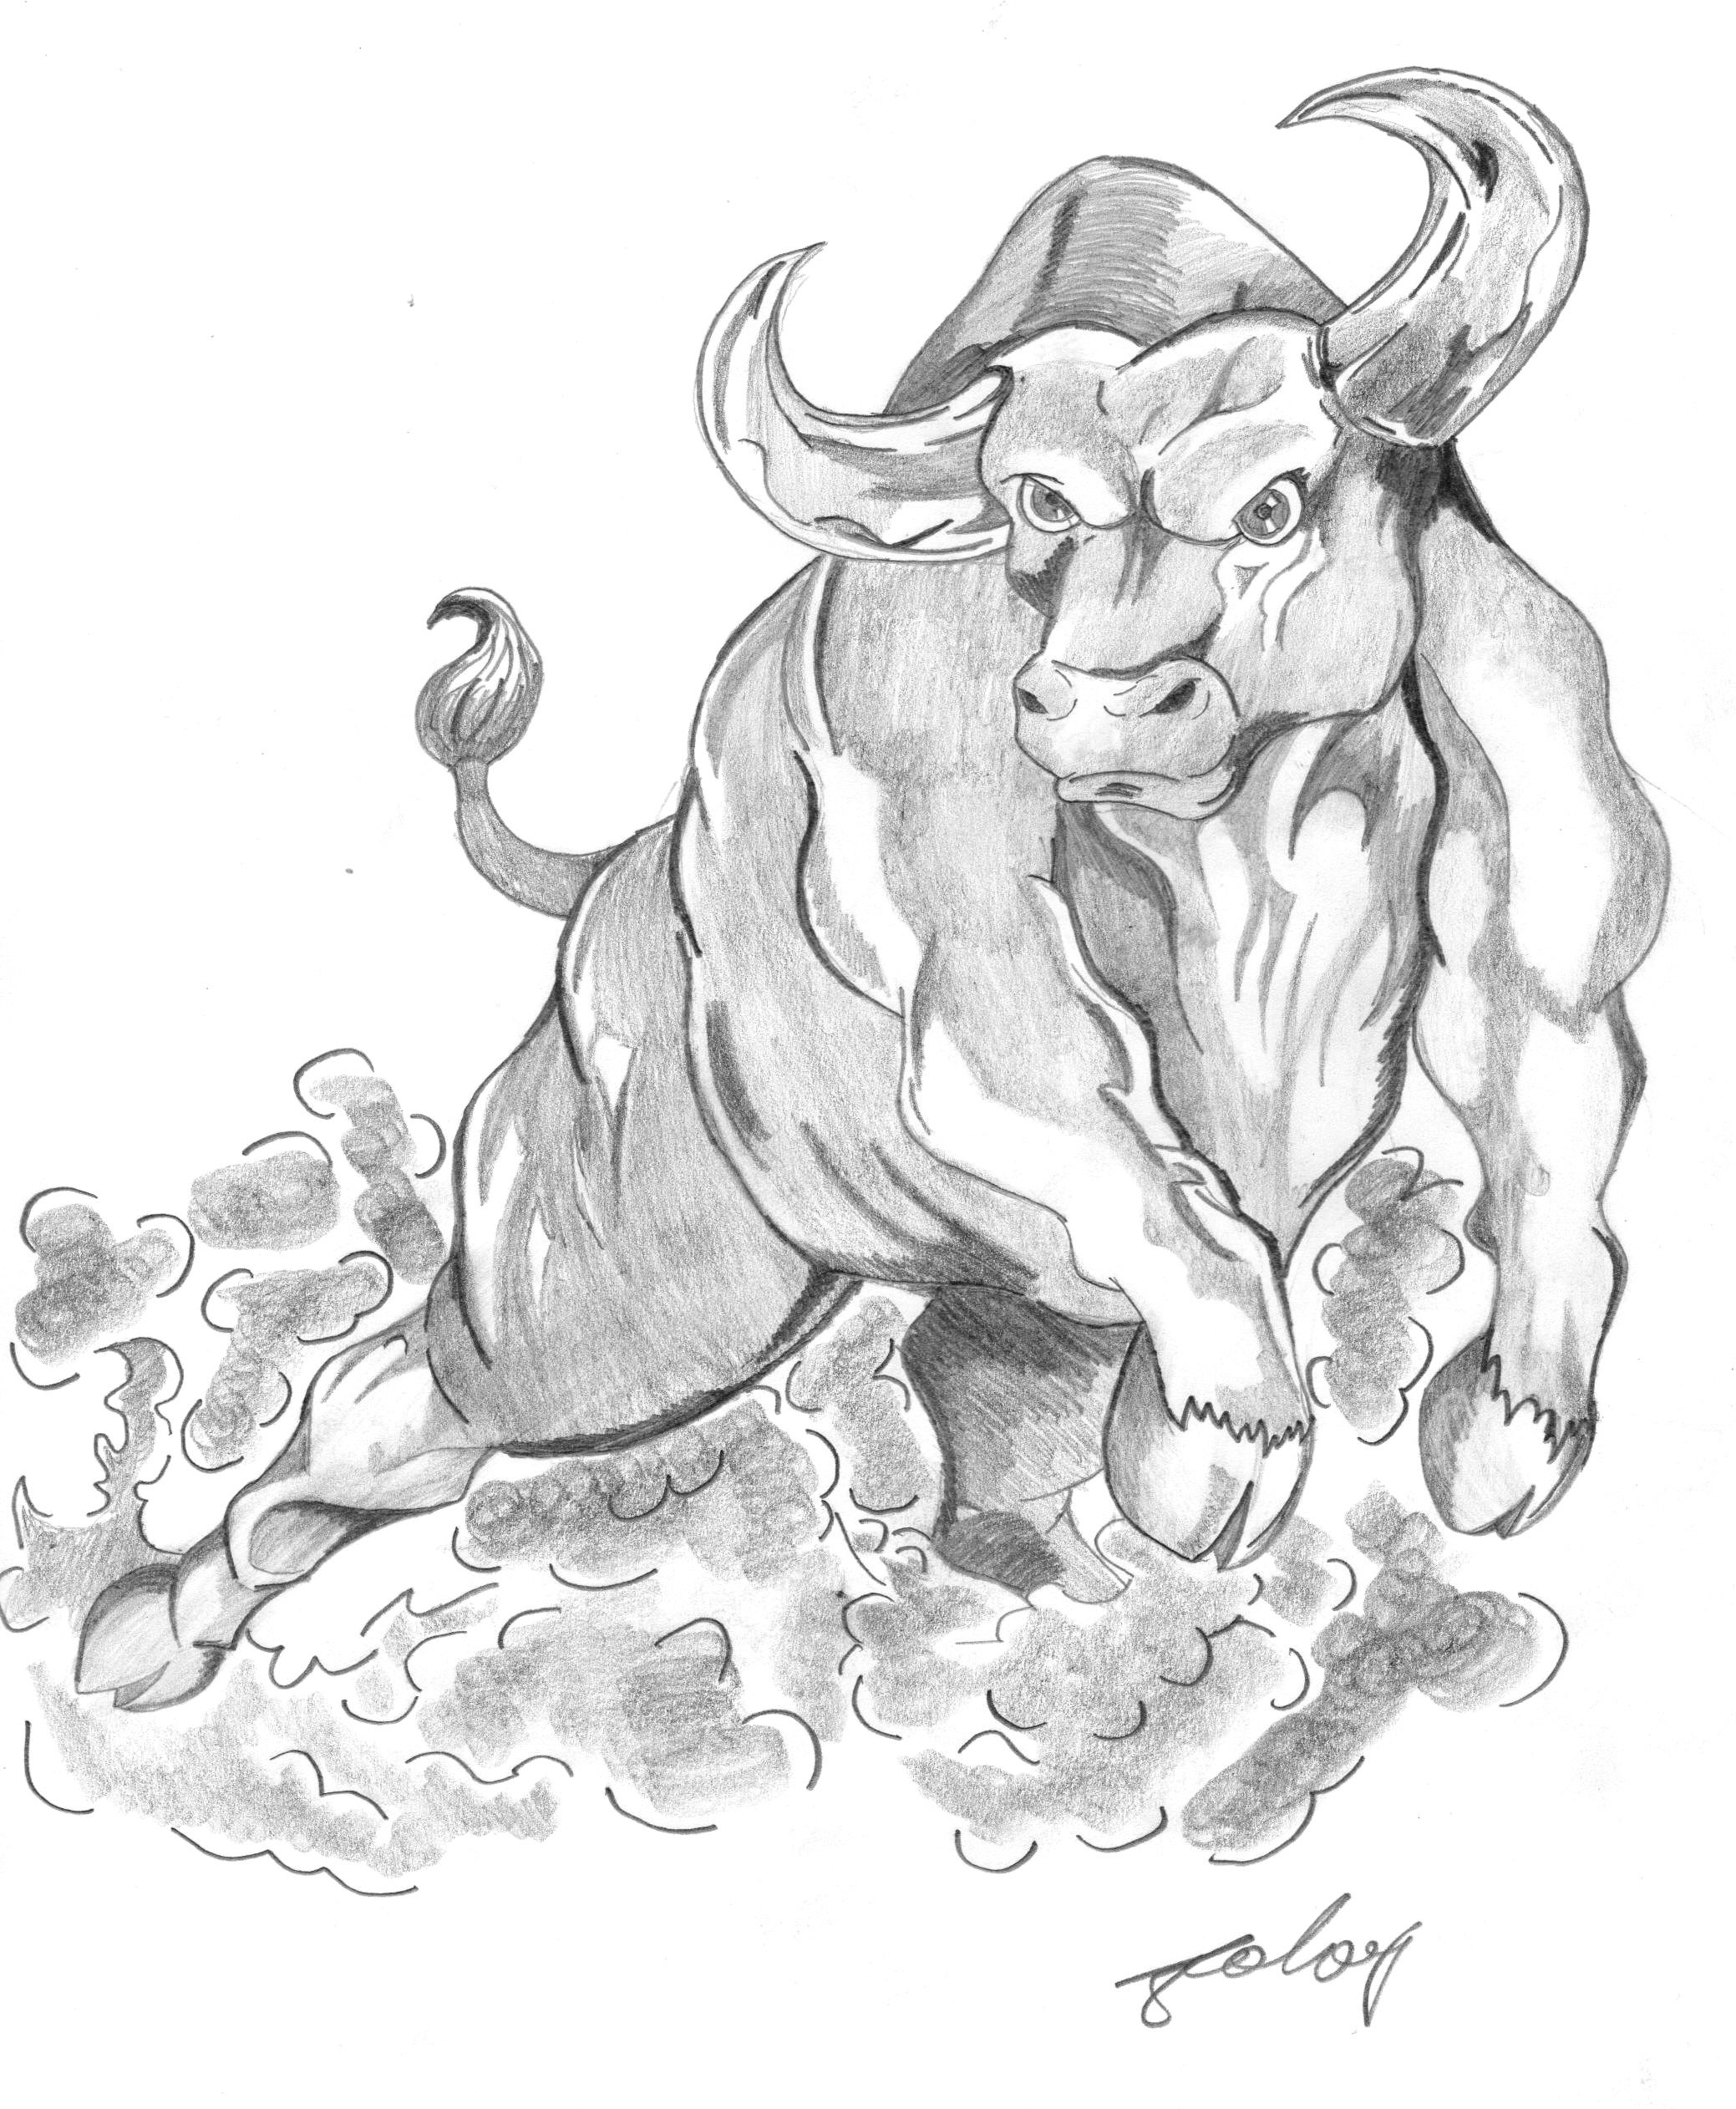 Картинка как нарисовать быка